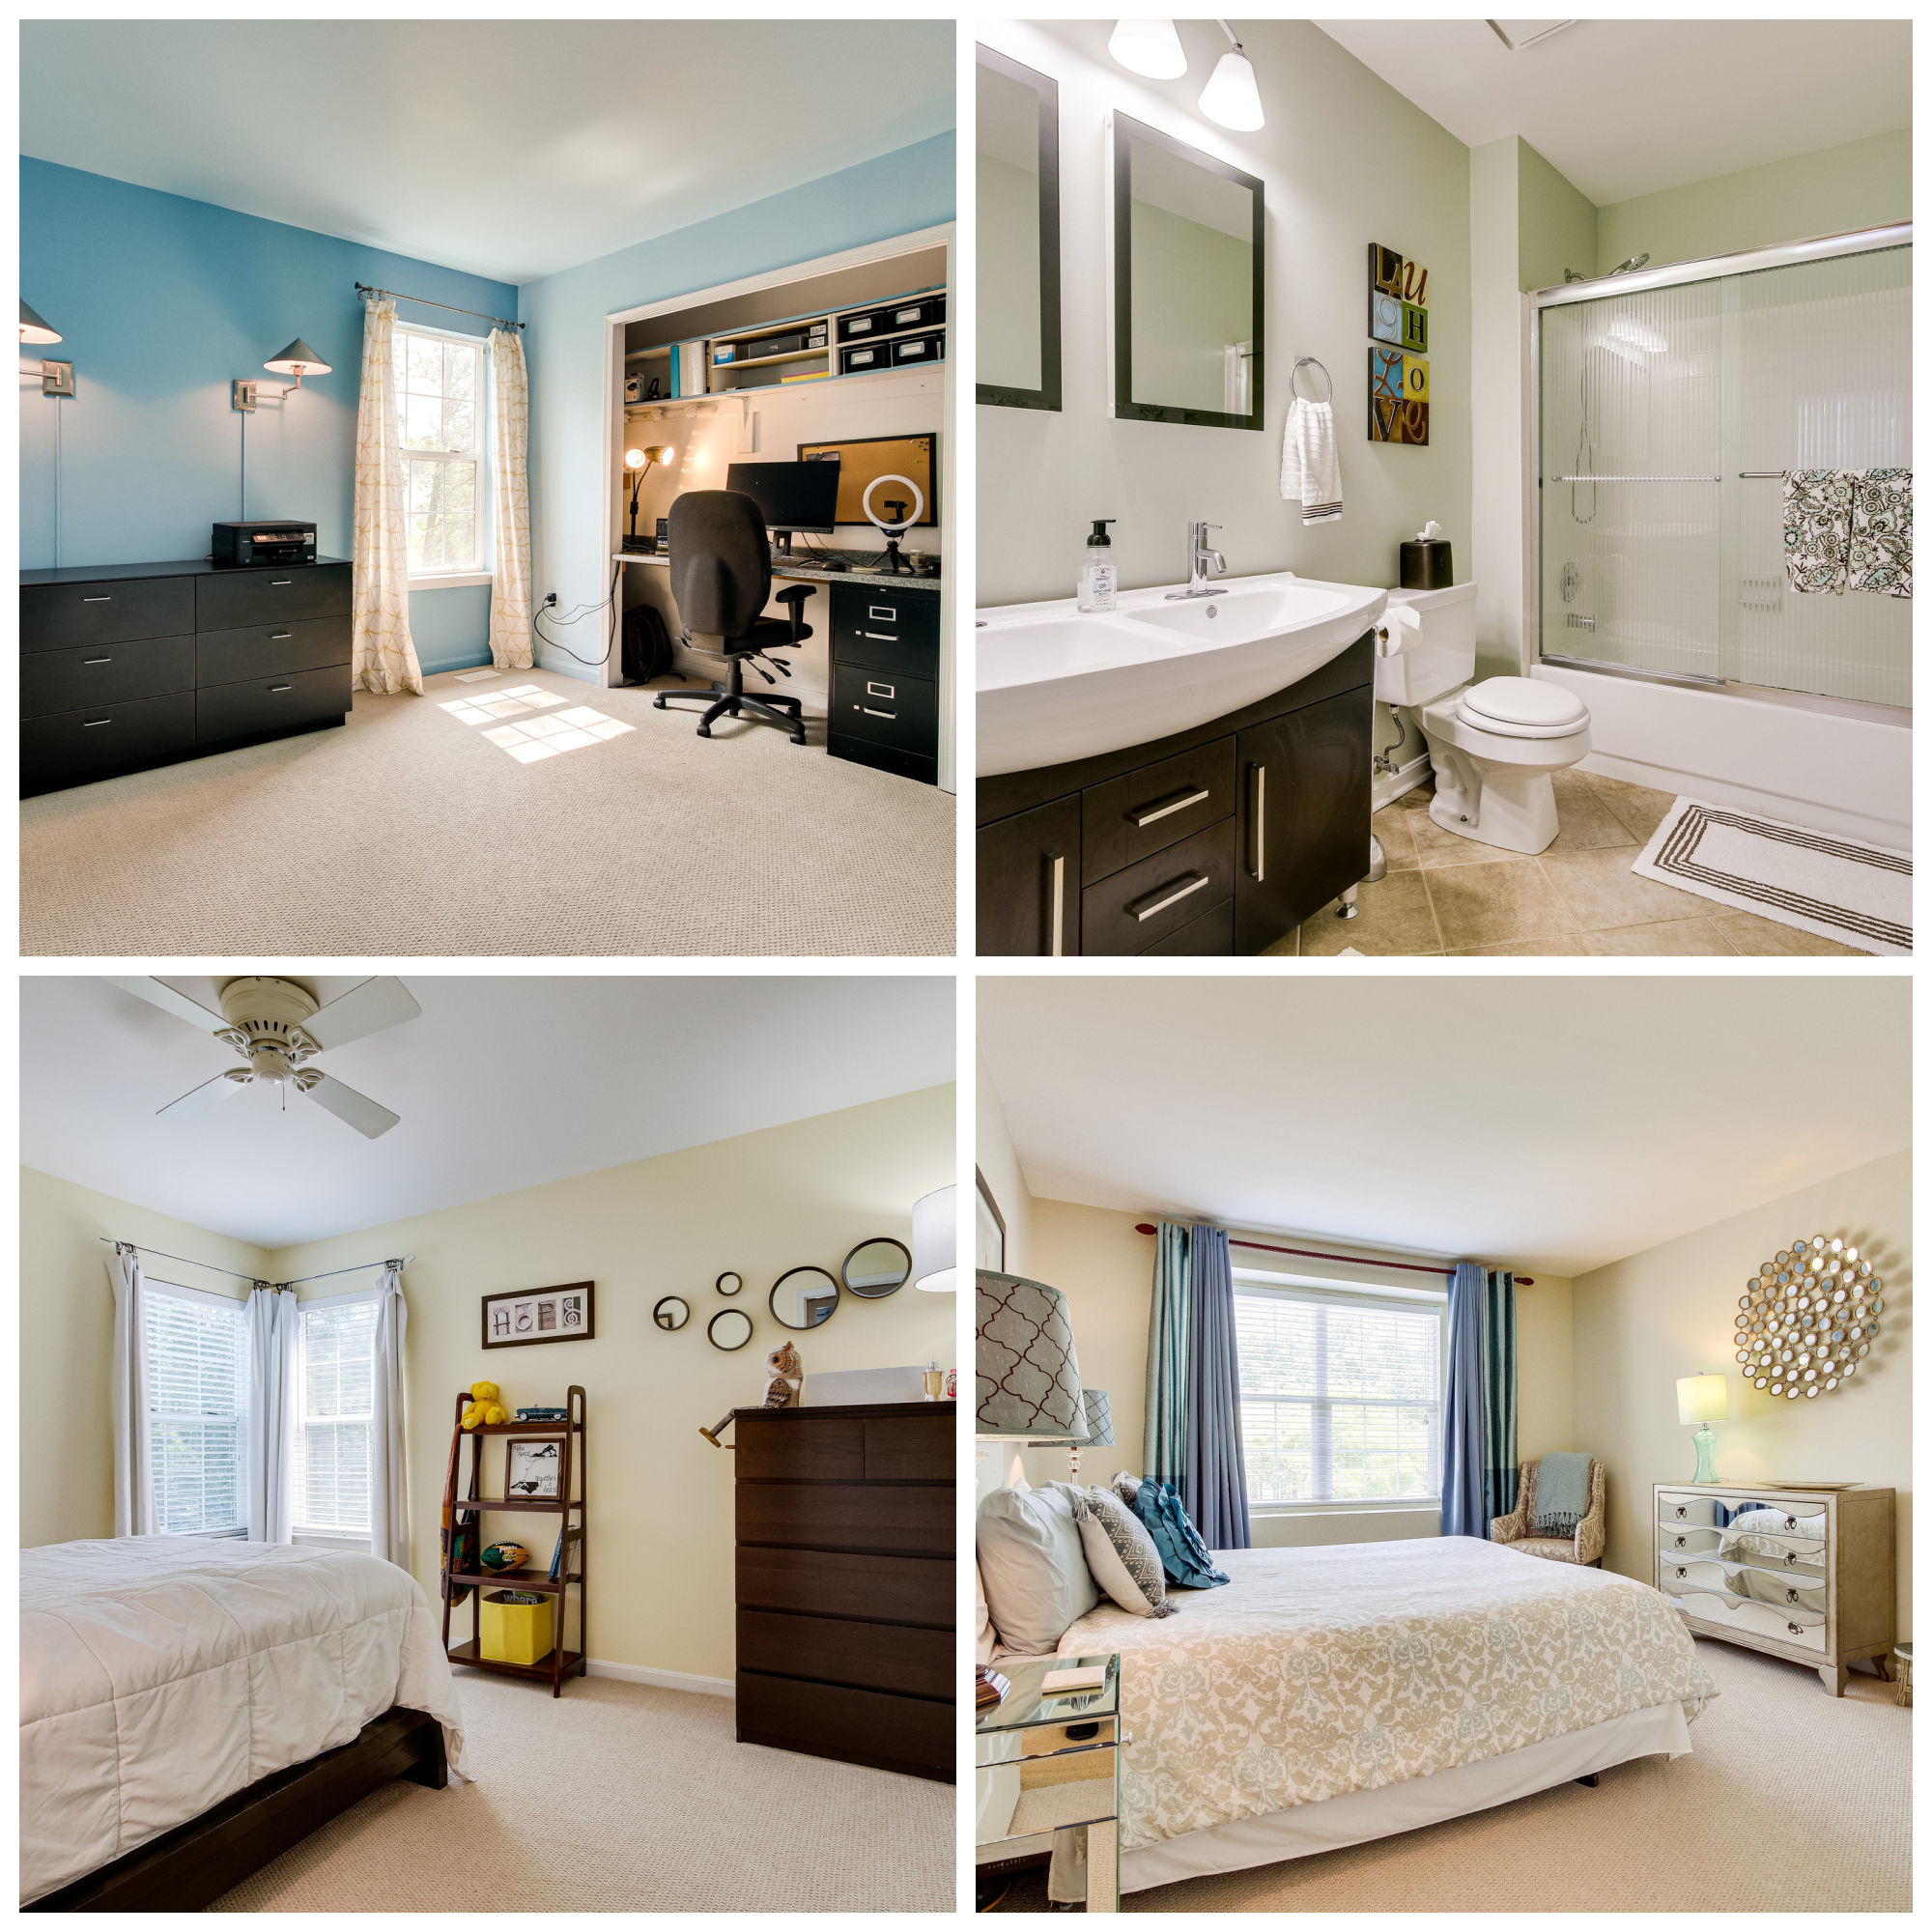 21002 Fernridge Way, Ashburn- Additional Bedrooms and Bath